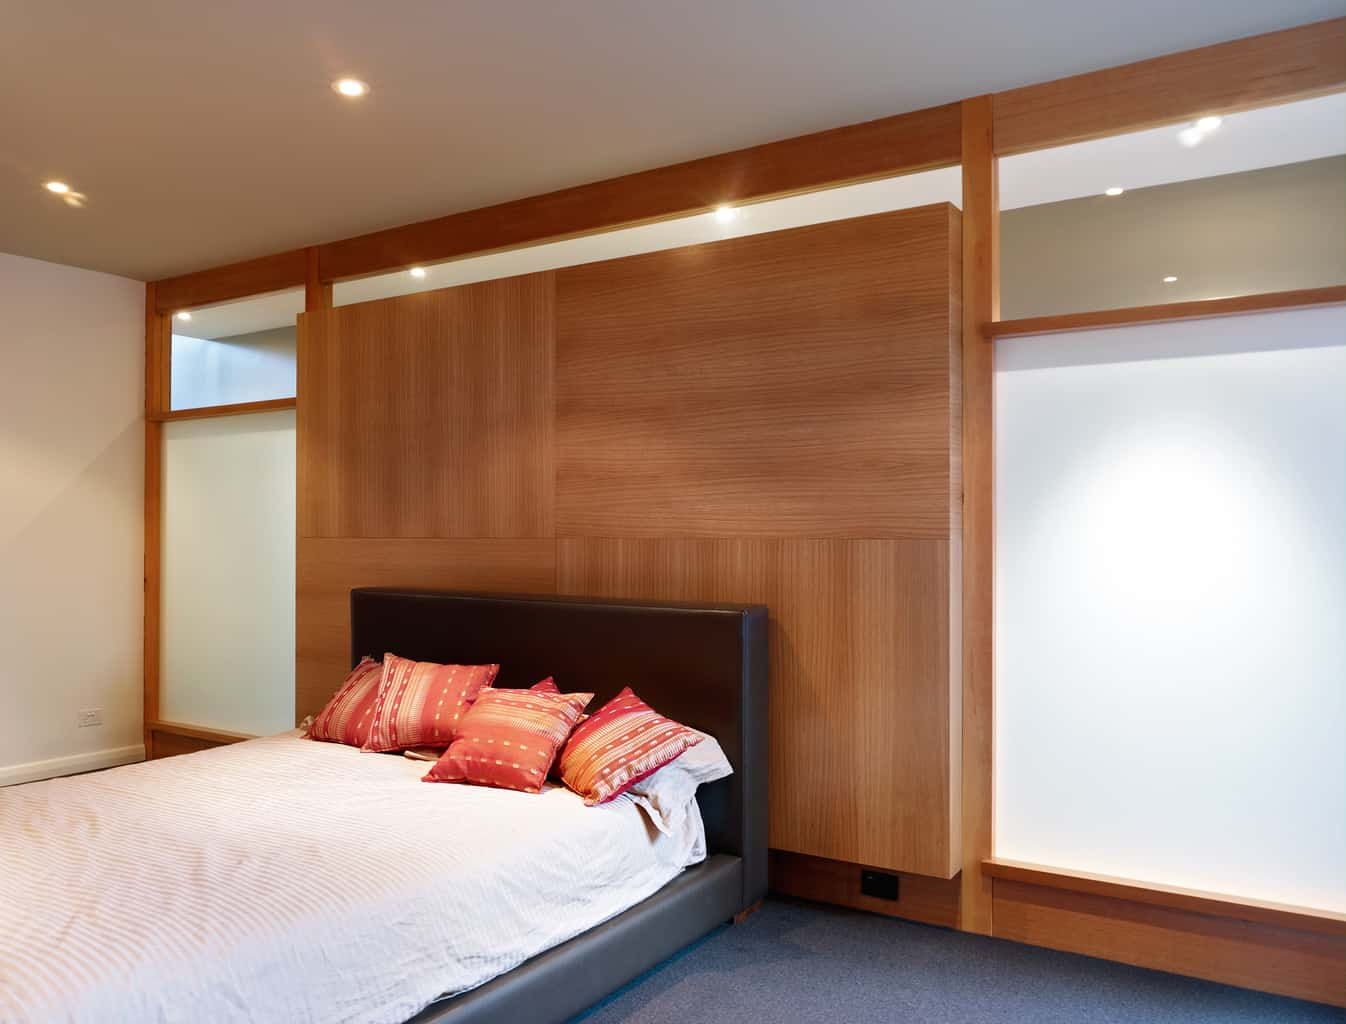 06DMABedfordbedroom1